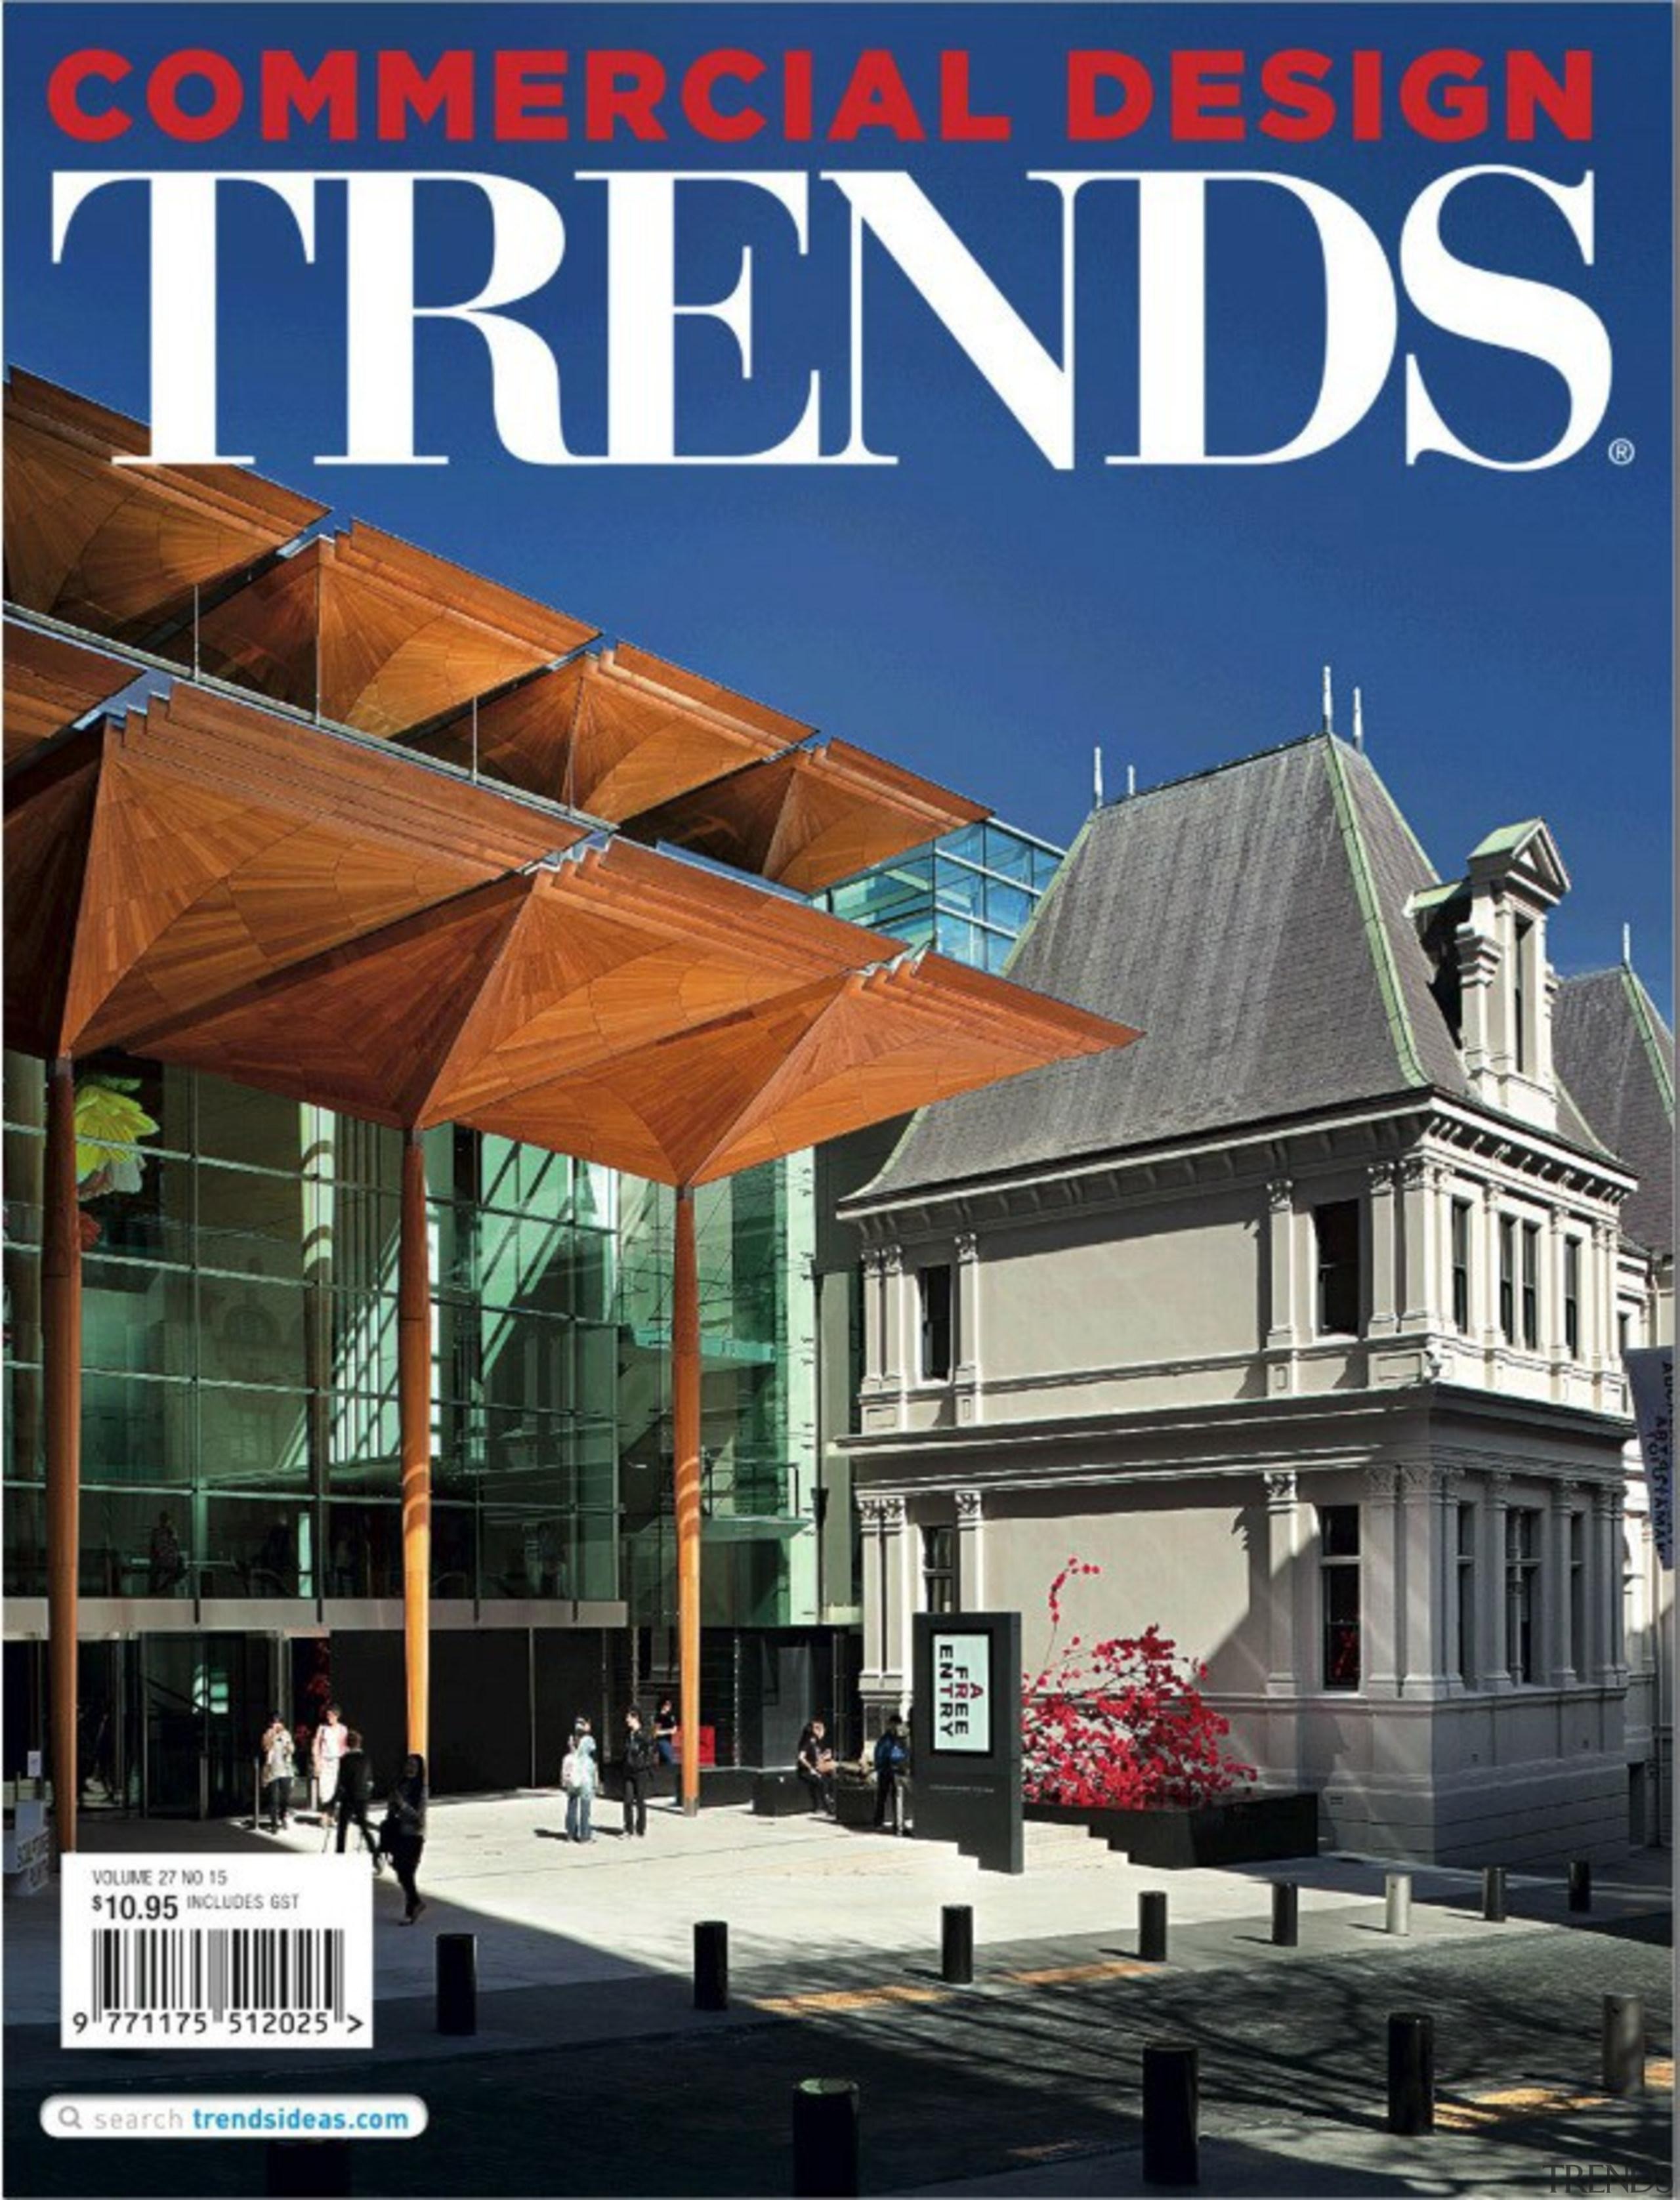 Book Cover Nz2715 architecture, building, facade, black